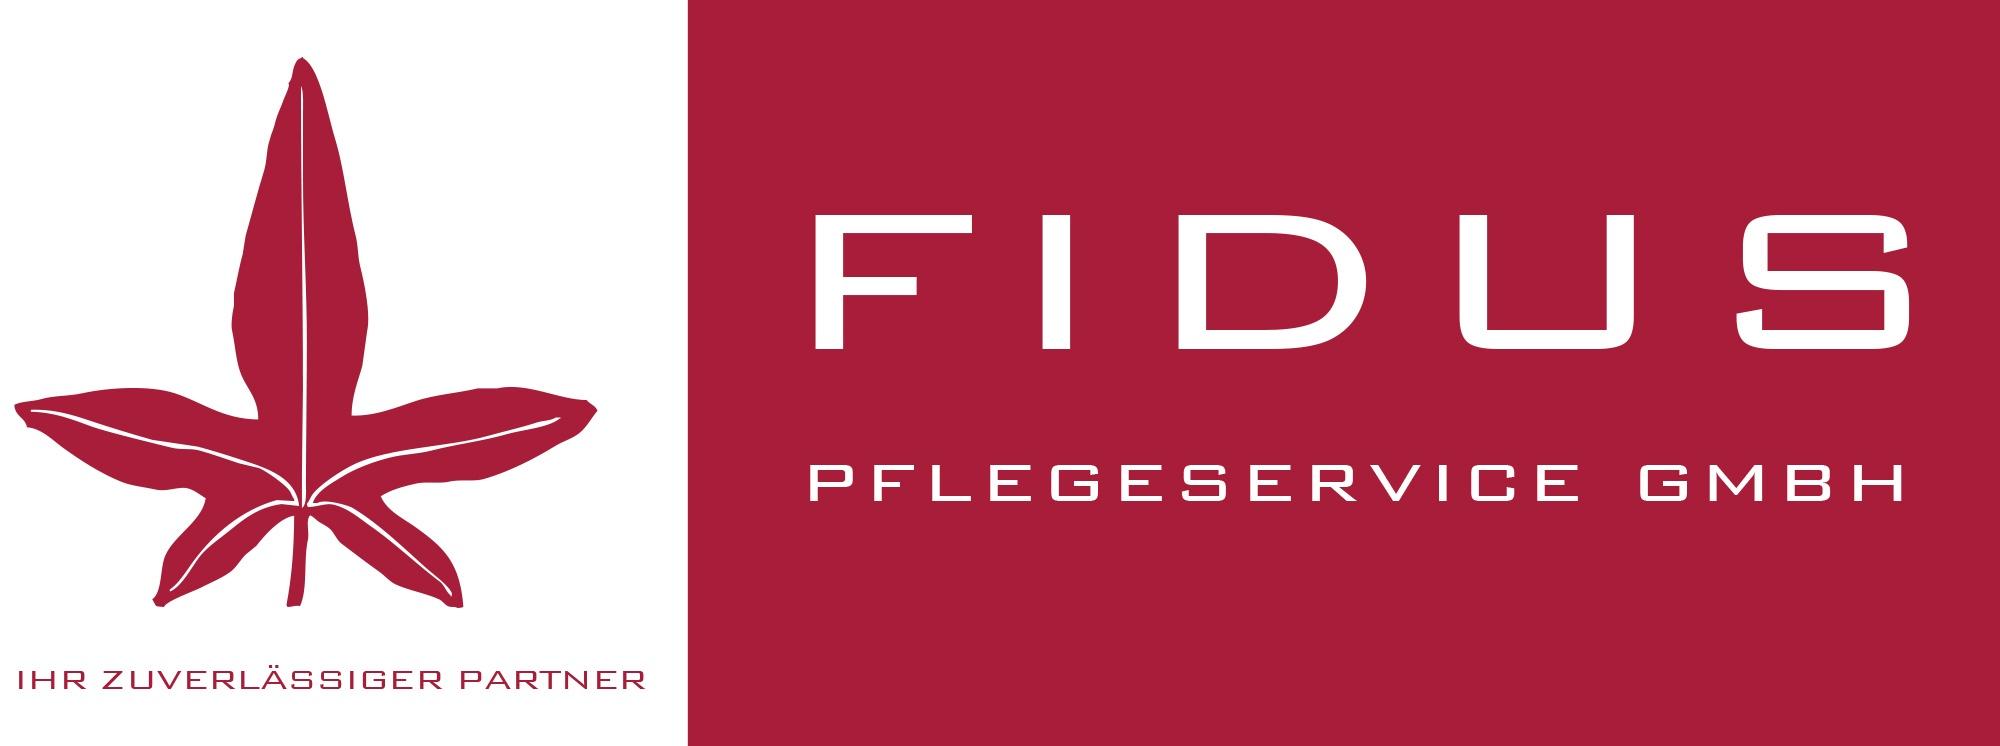 Fidus Pflegeservice GmbH